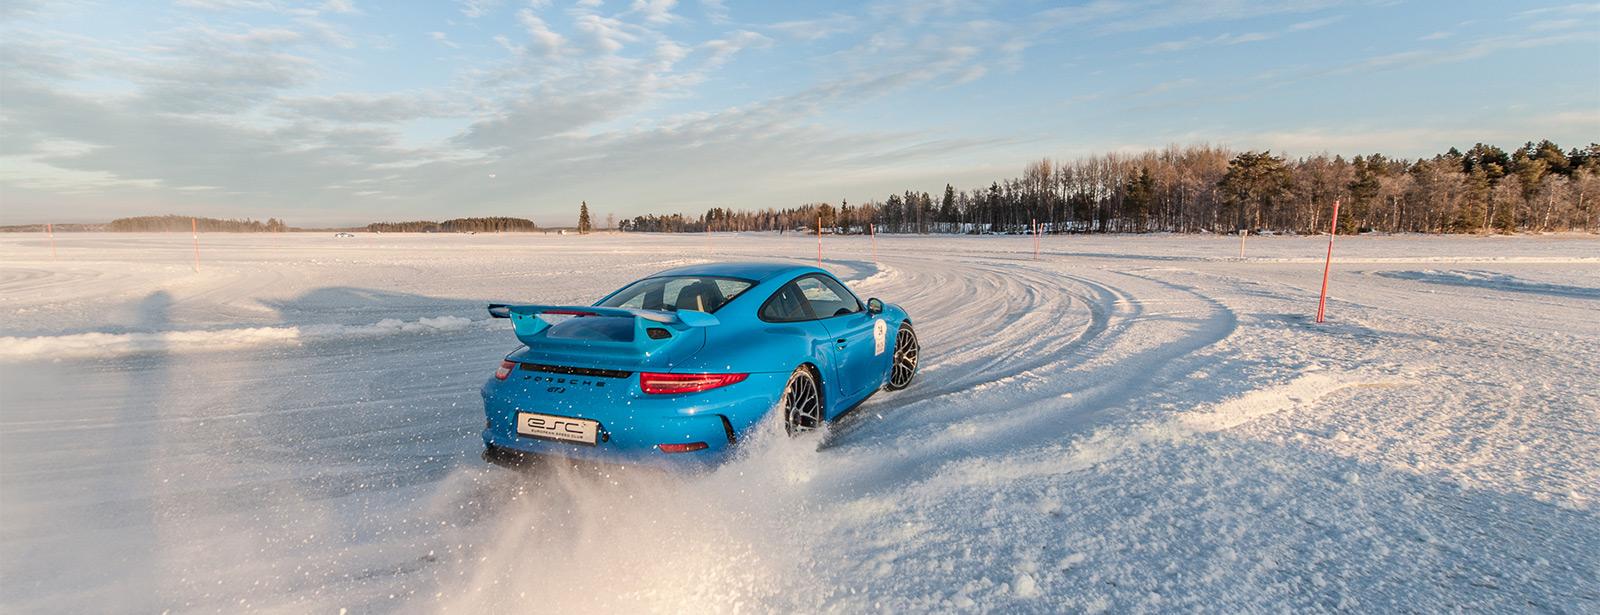 Events 2018 | Winterfahrtraining Lappland